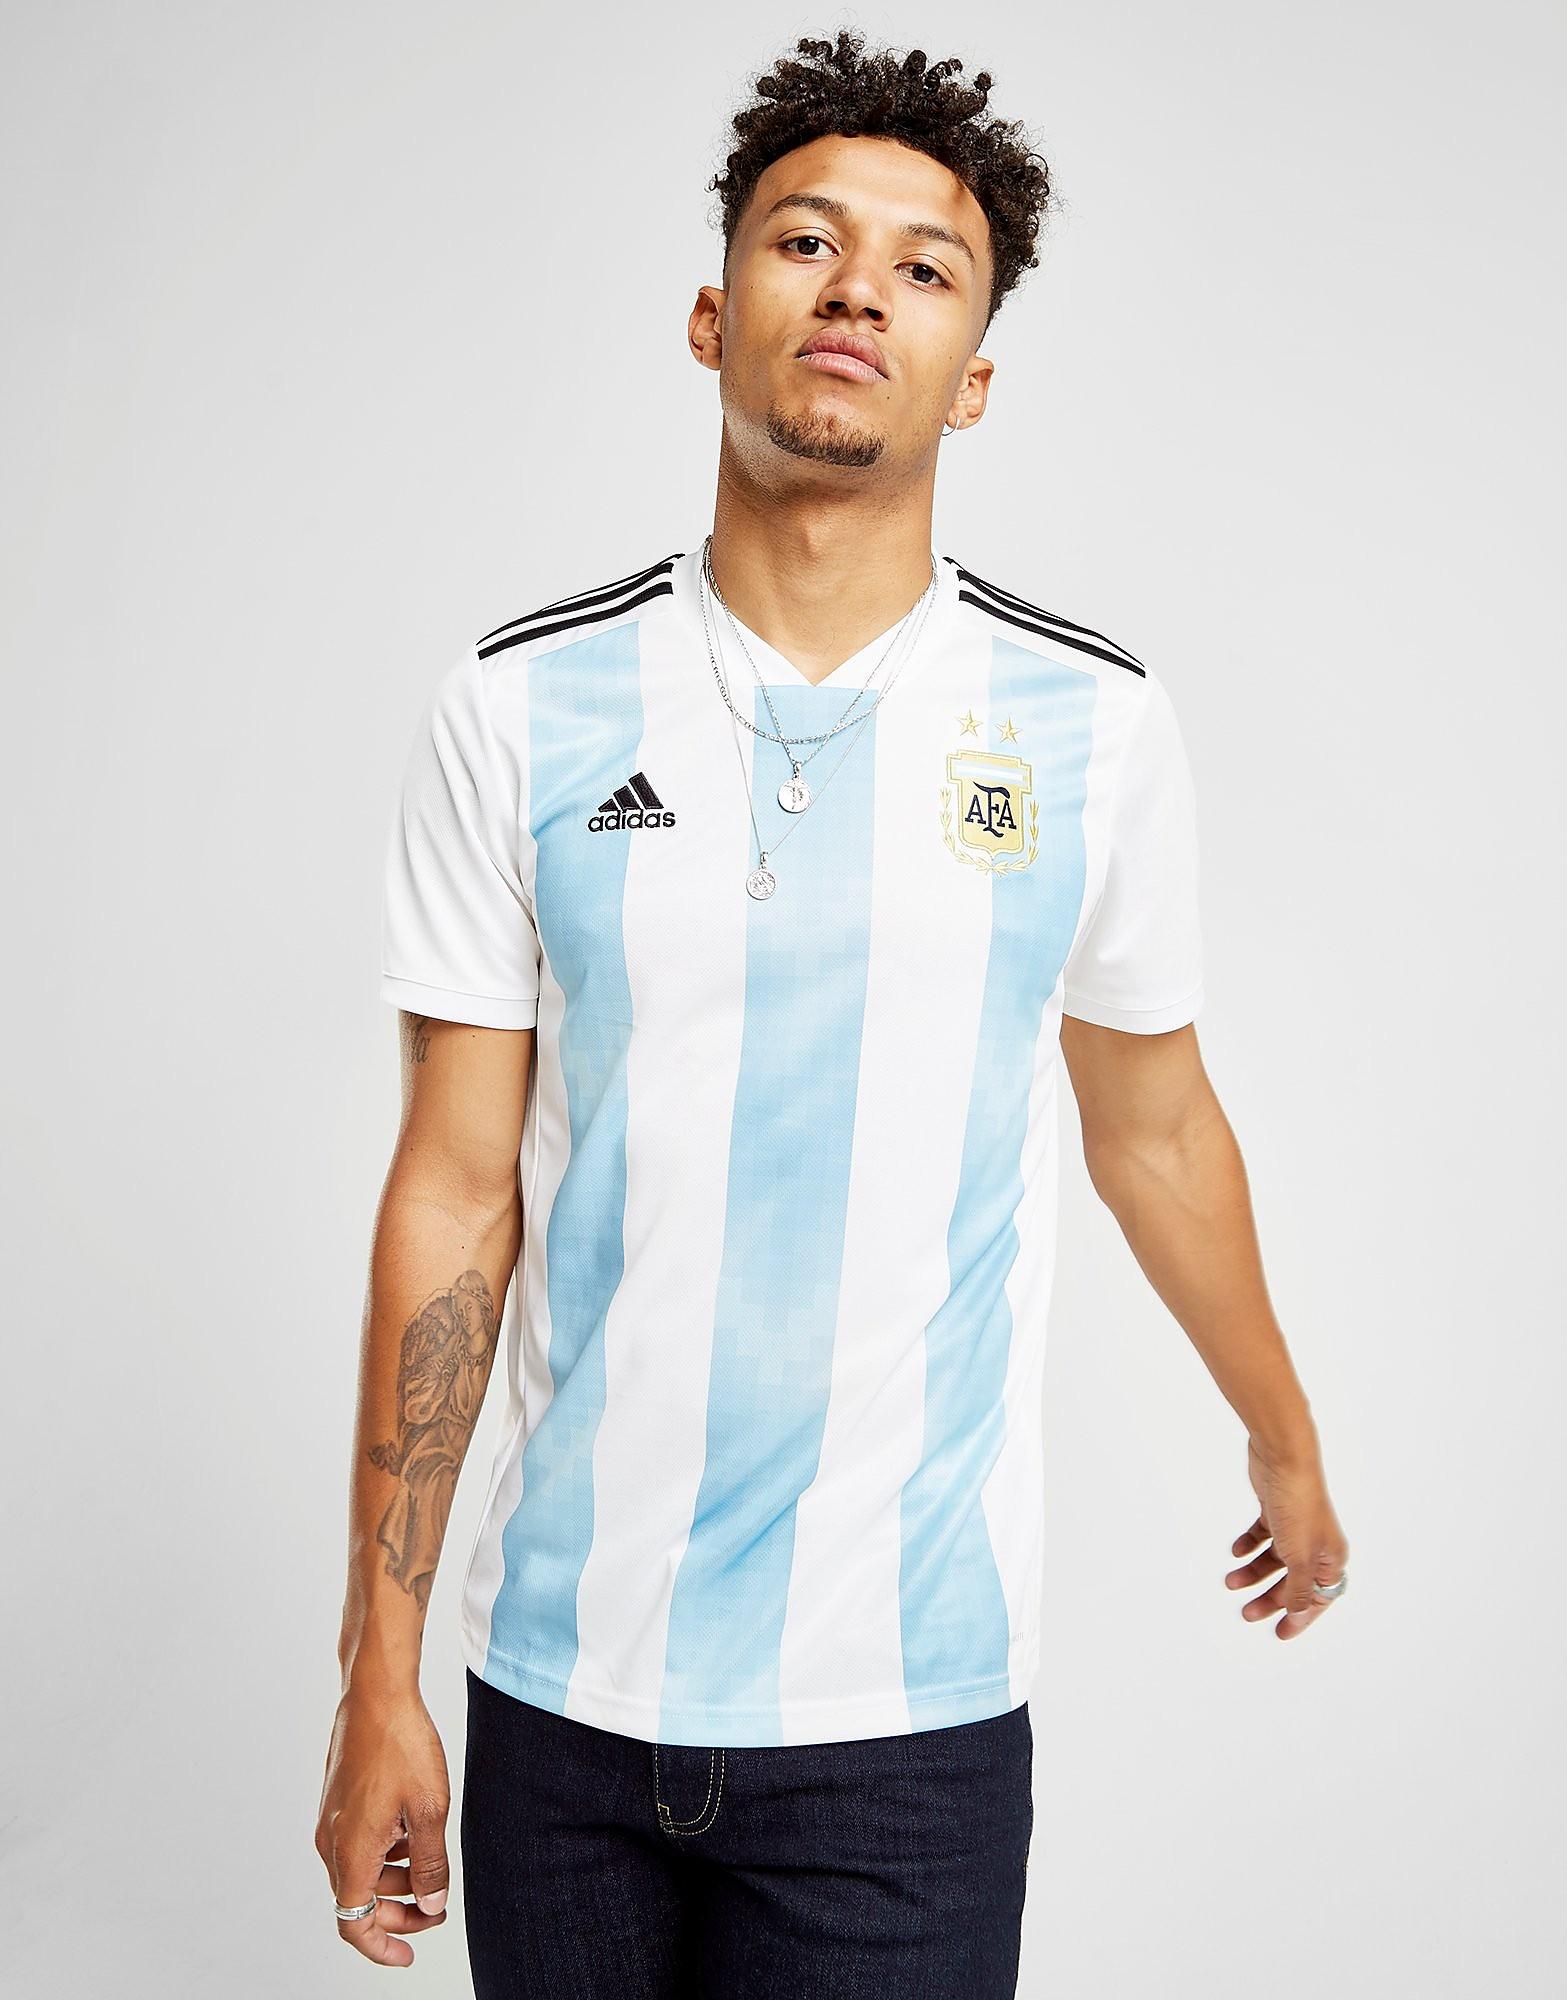 adidas camiseta Argentina 2017/18 1.ª equipación